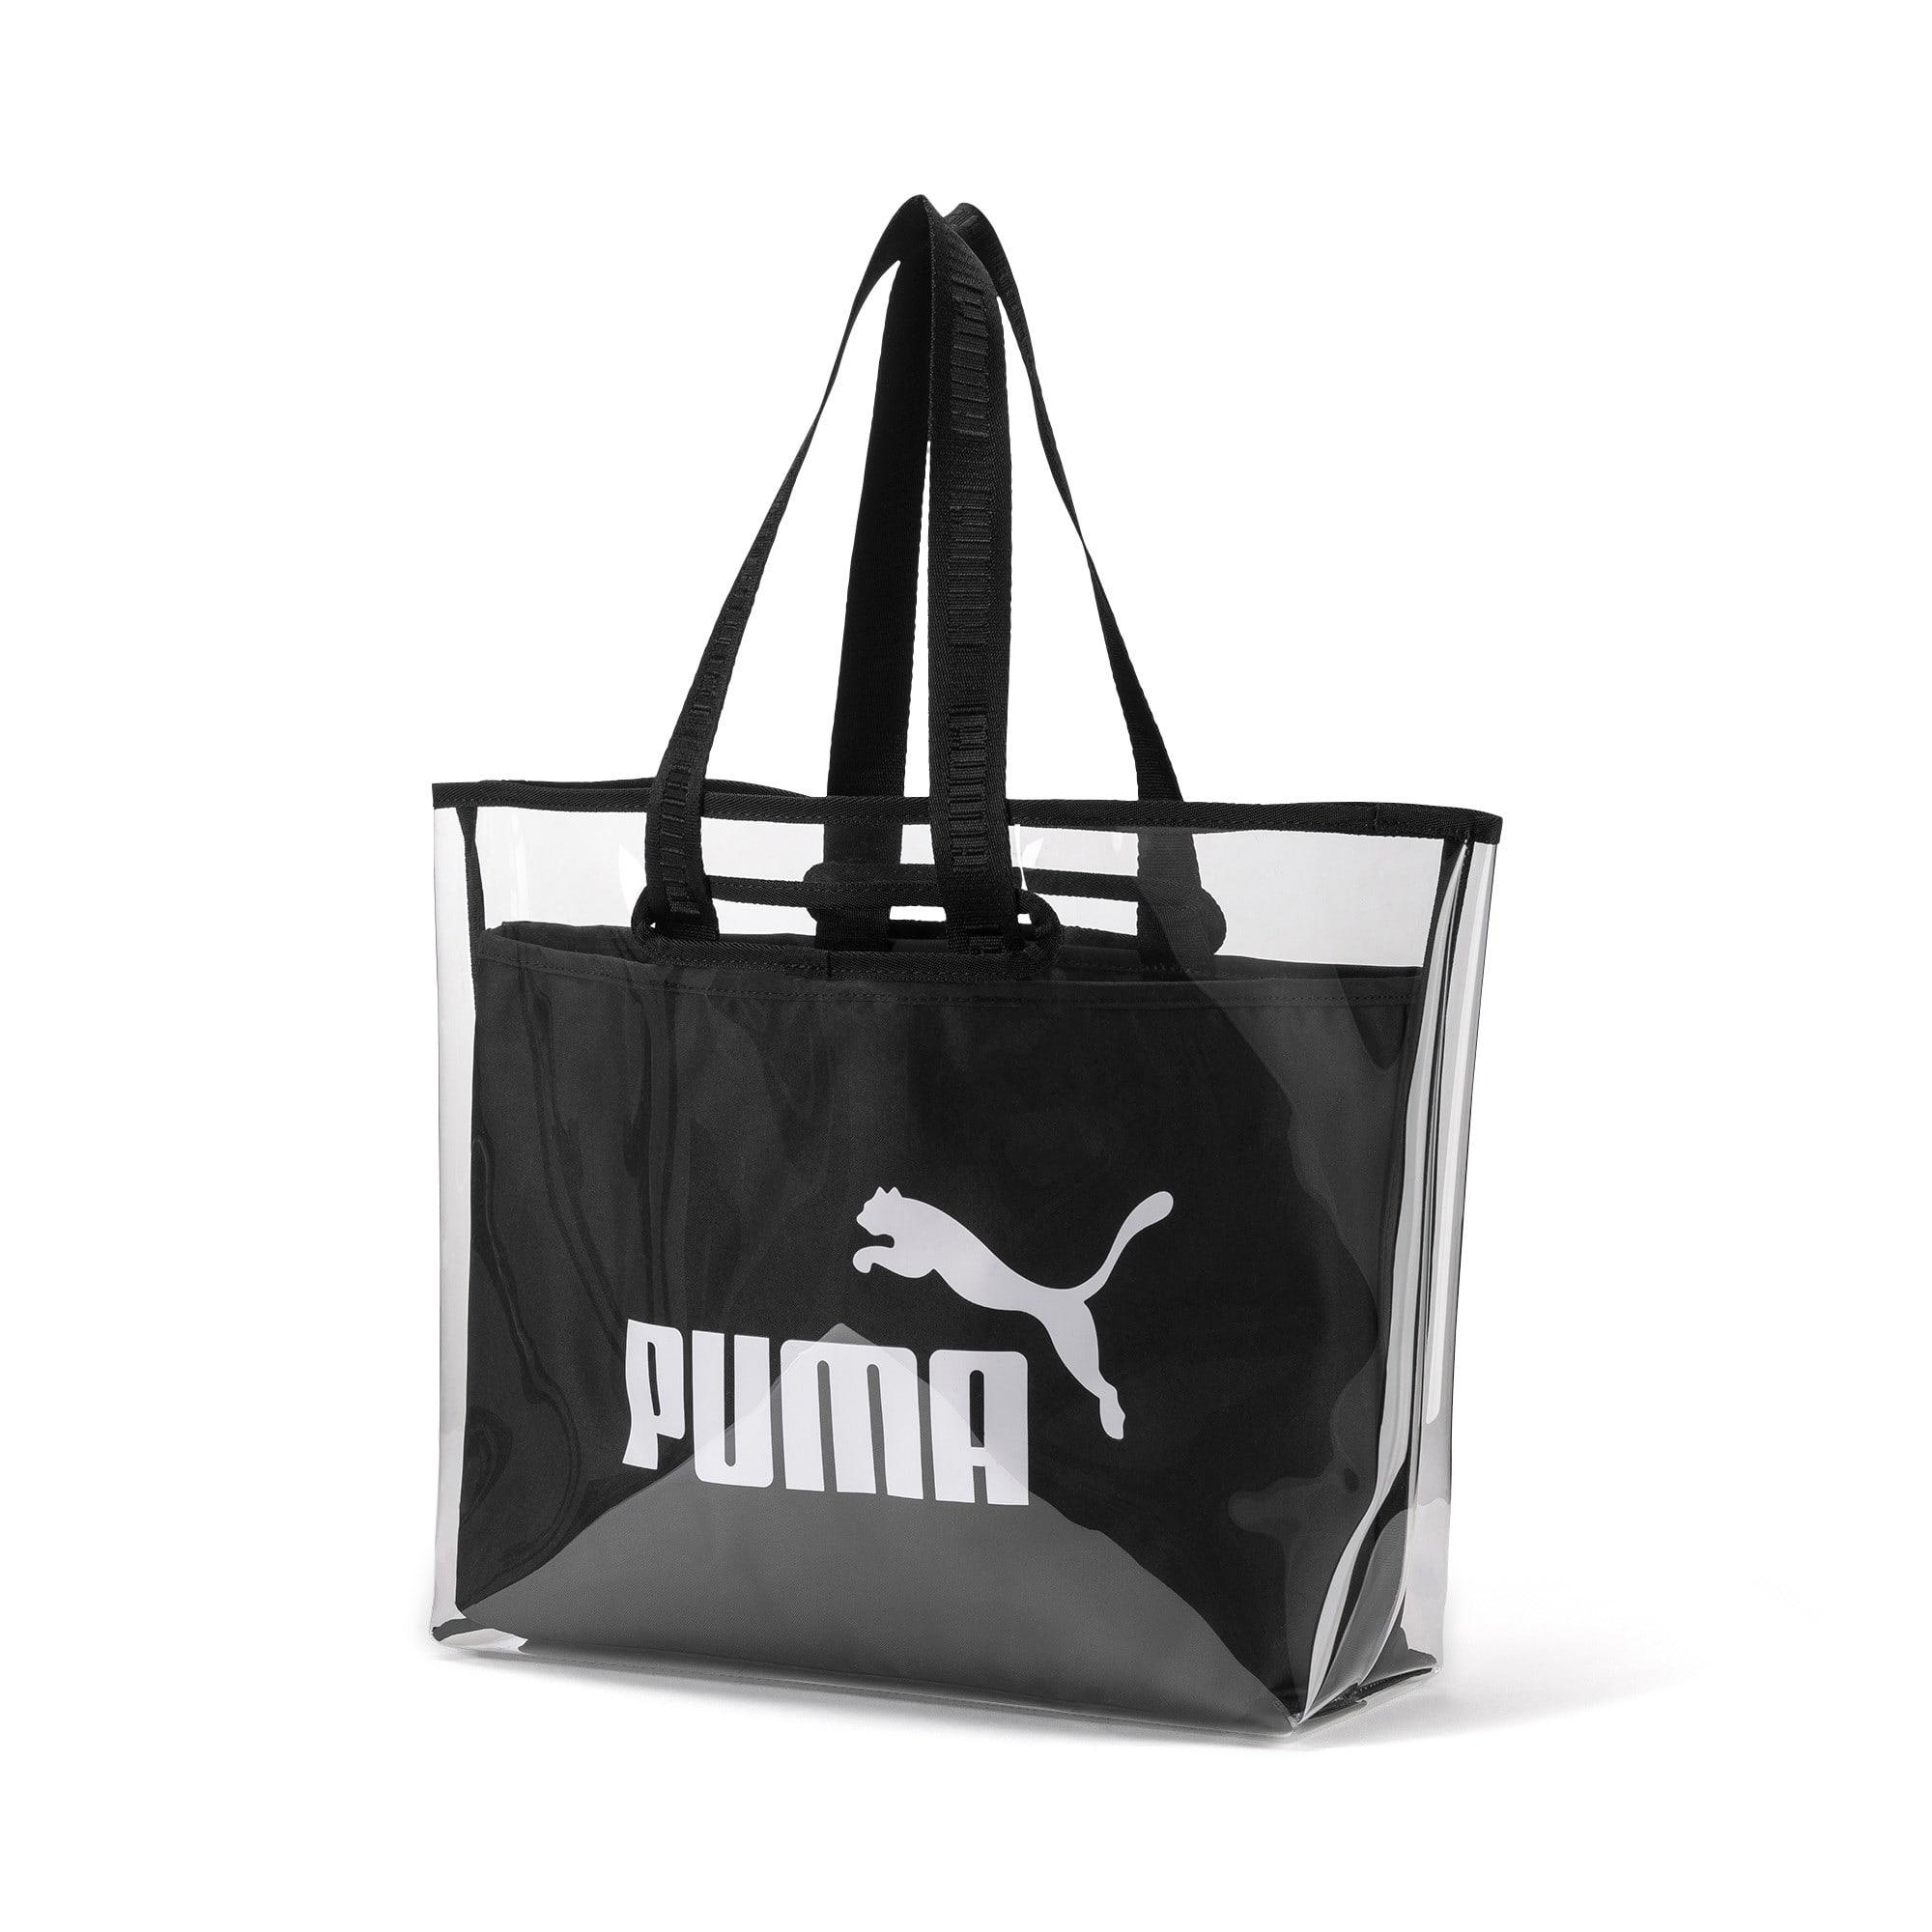 Thumbnail 1 of Women's Twin Shopper, Puma Black, medium